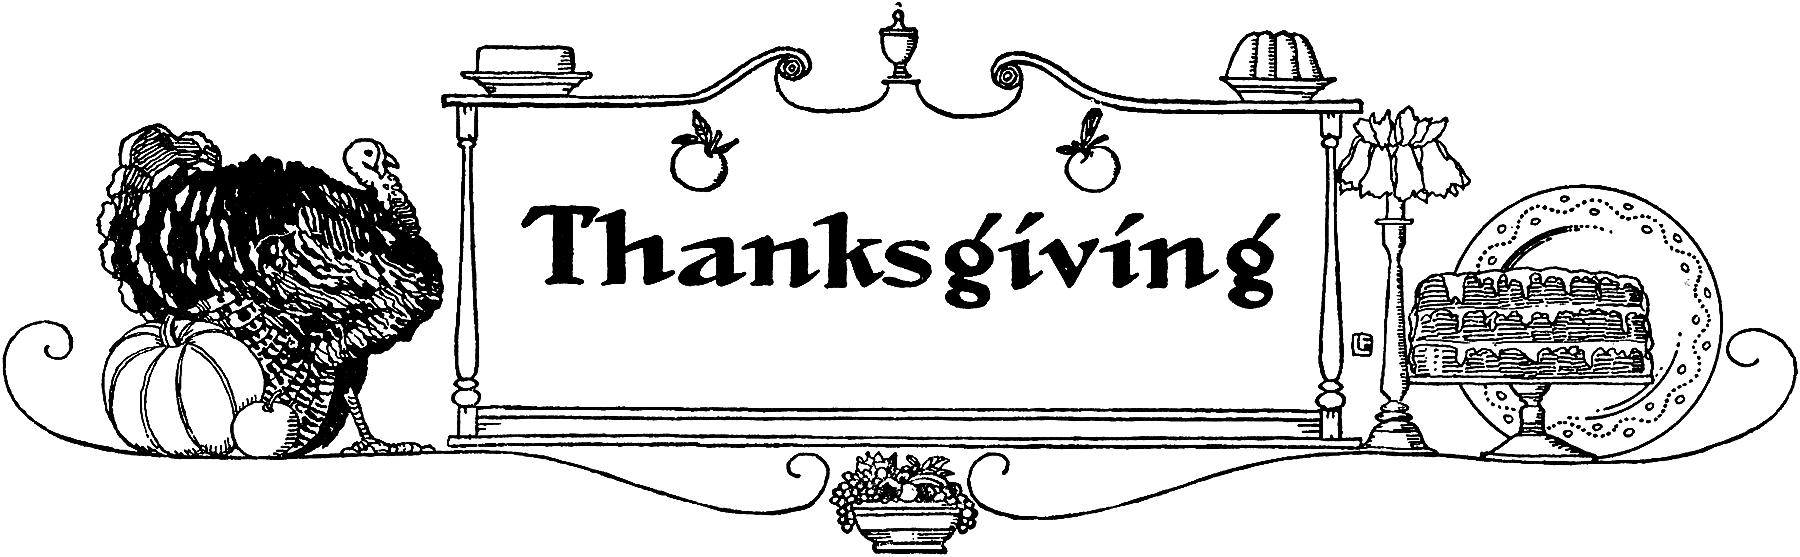 Vintage Thanksgiving Banner Clip Art